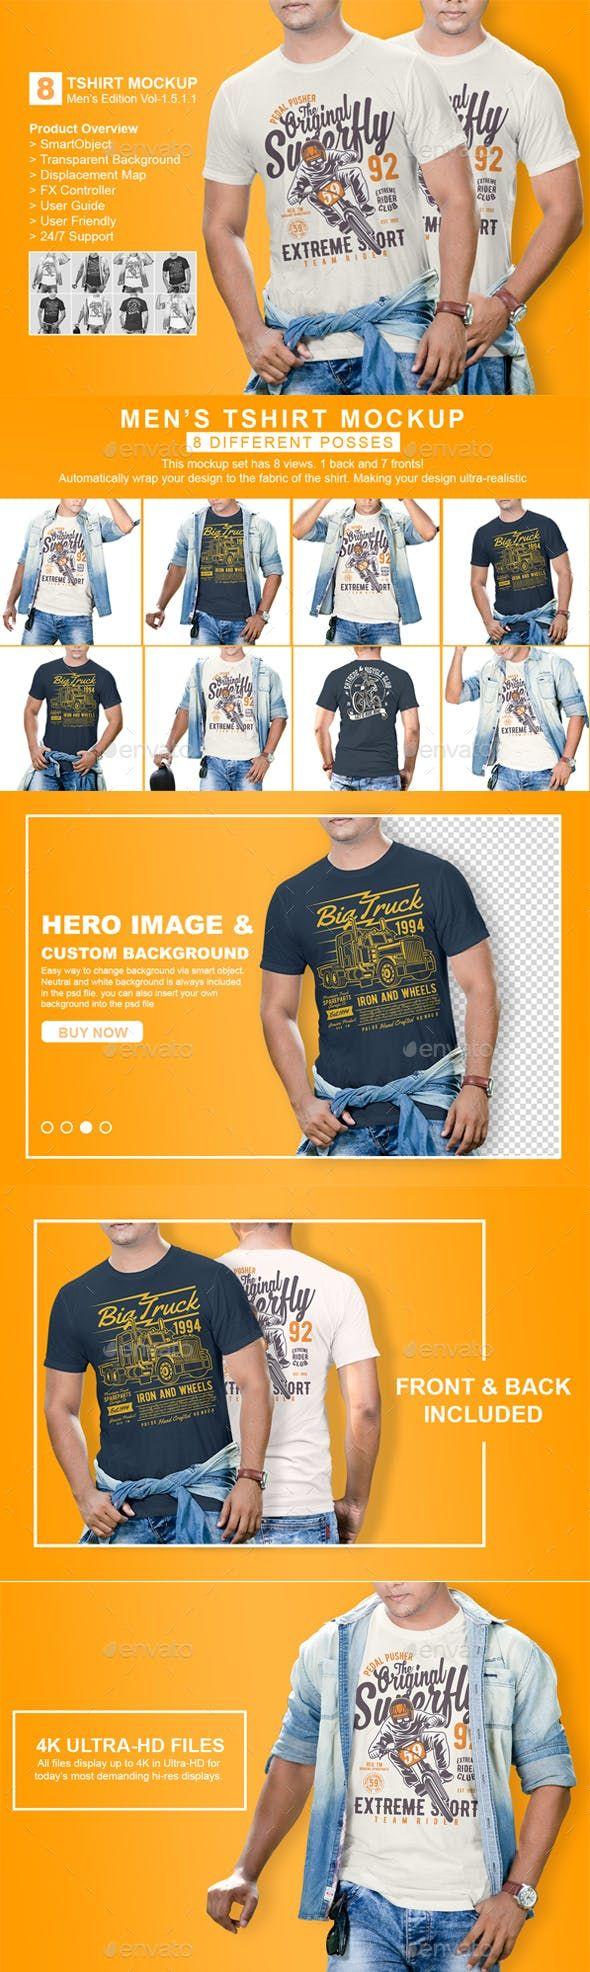 Download Mens Tshirt Mockup Vol 1 5 1 1 Clothing Mockup Tshirt Mockup Shirt Mockup